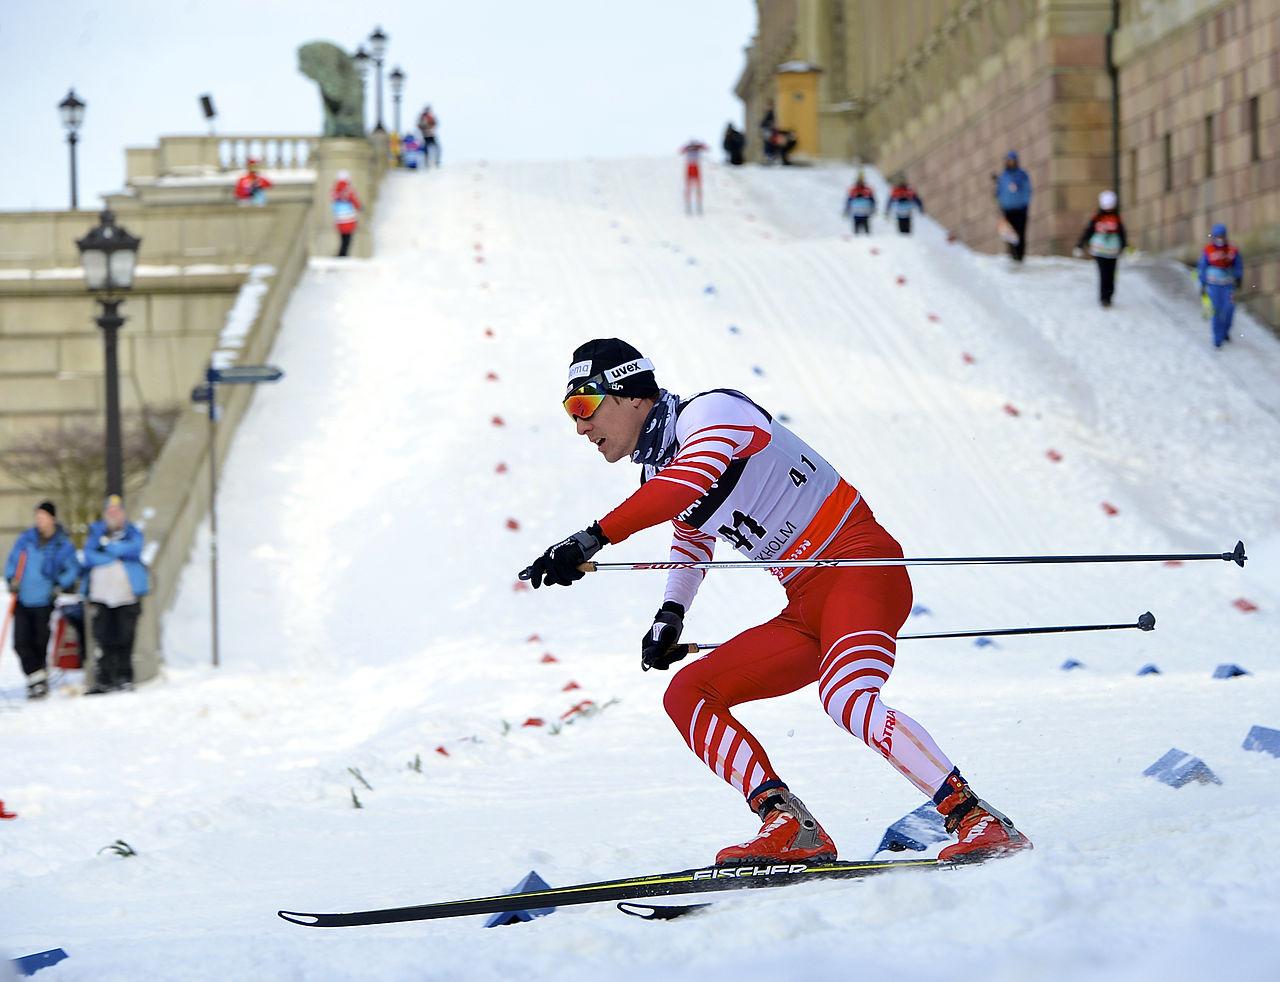 Skifahrer Johannes Dürr